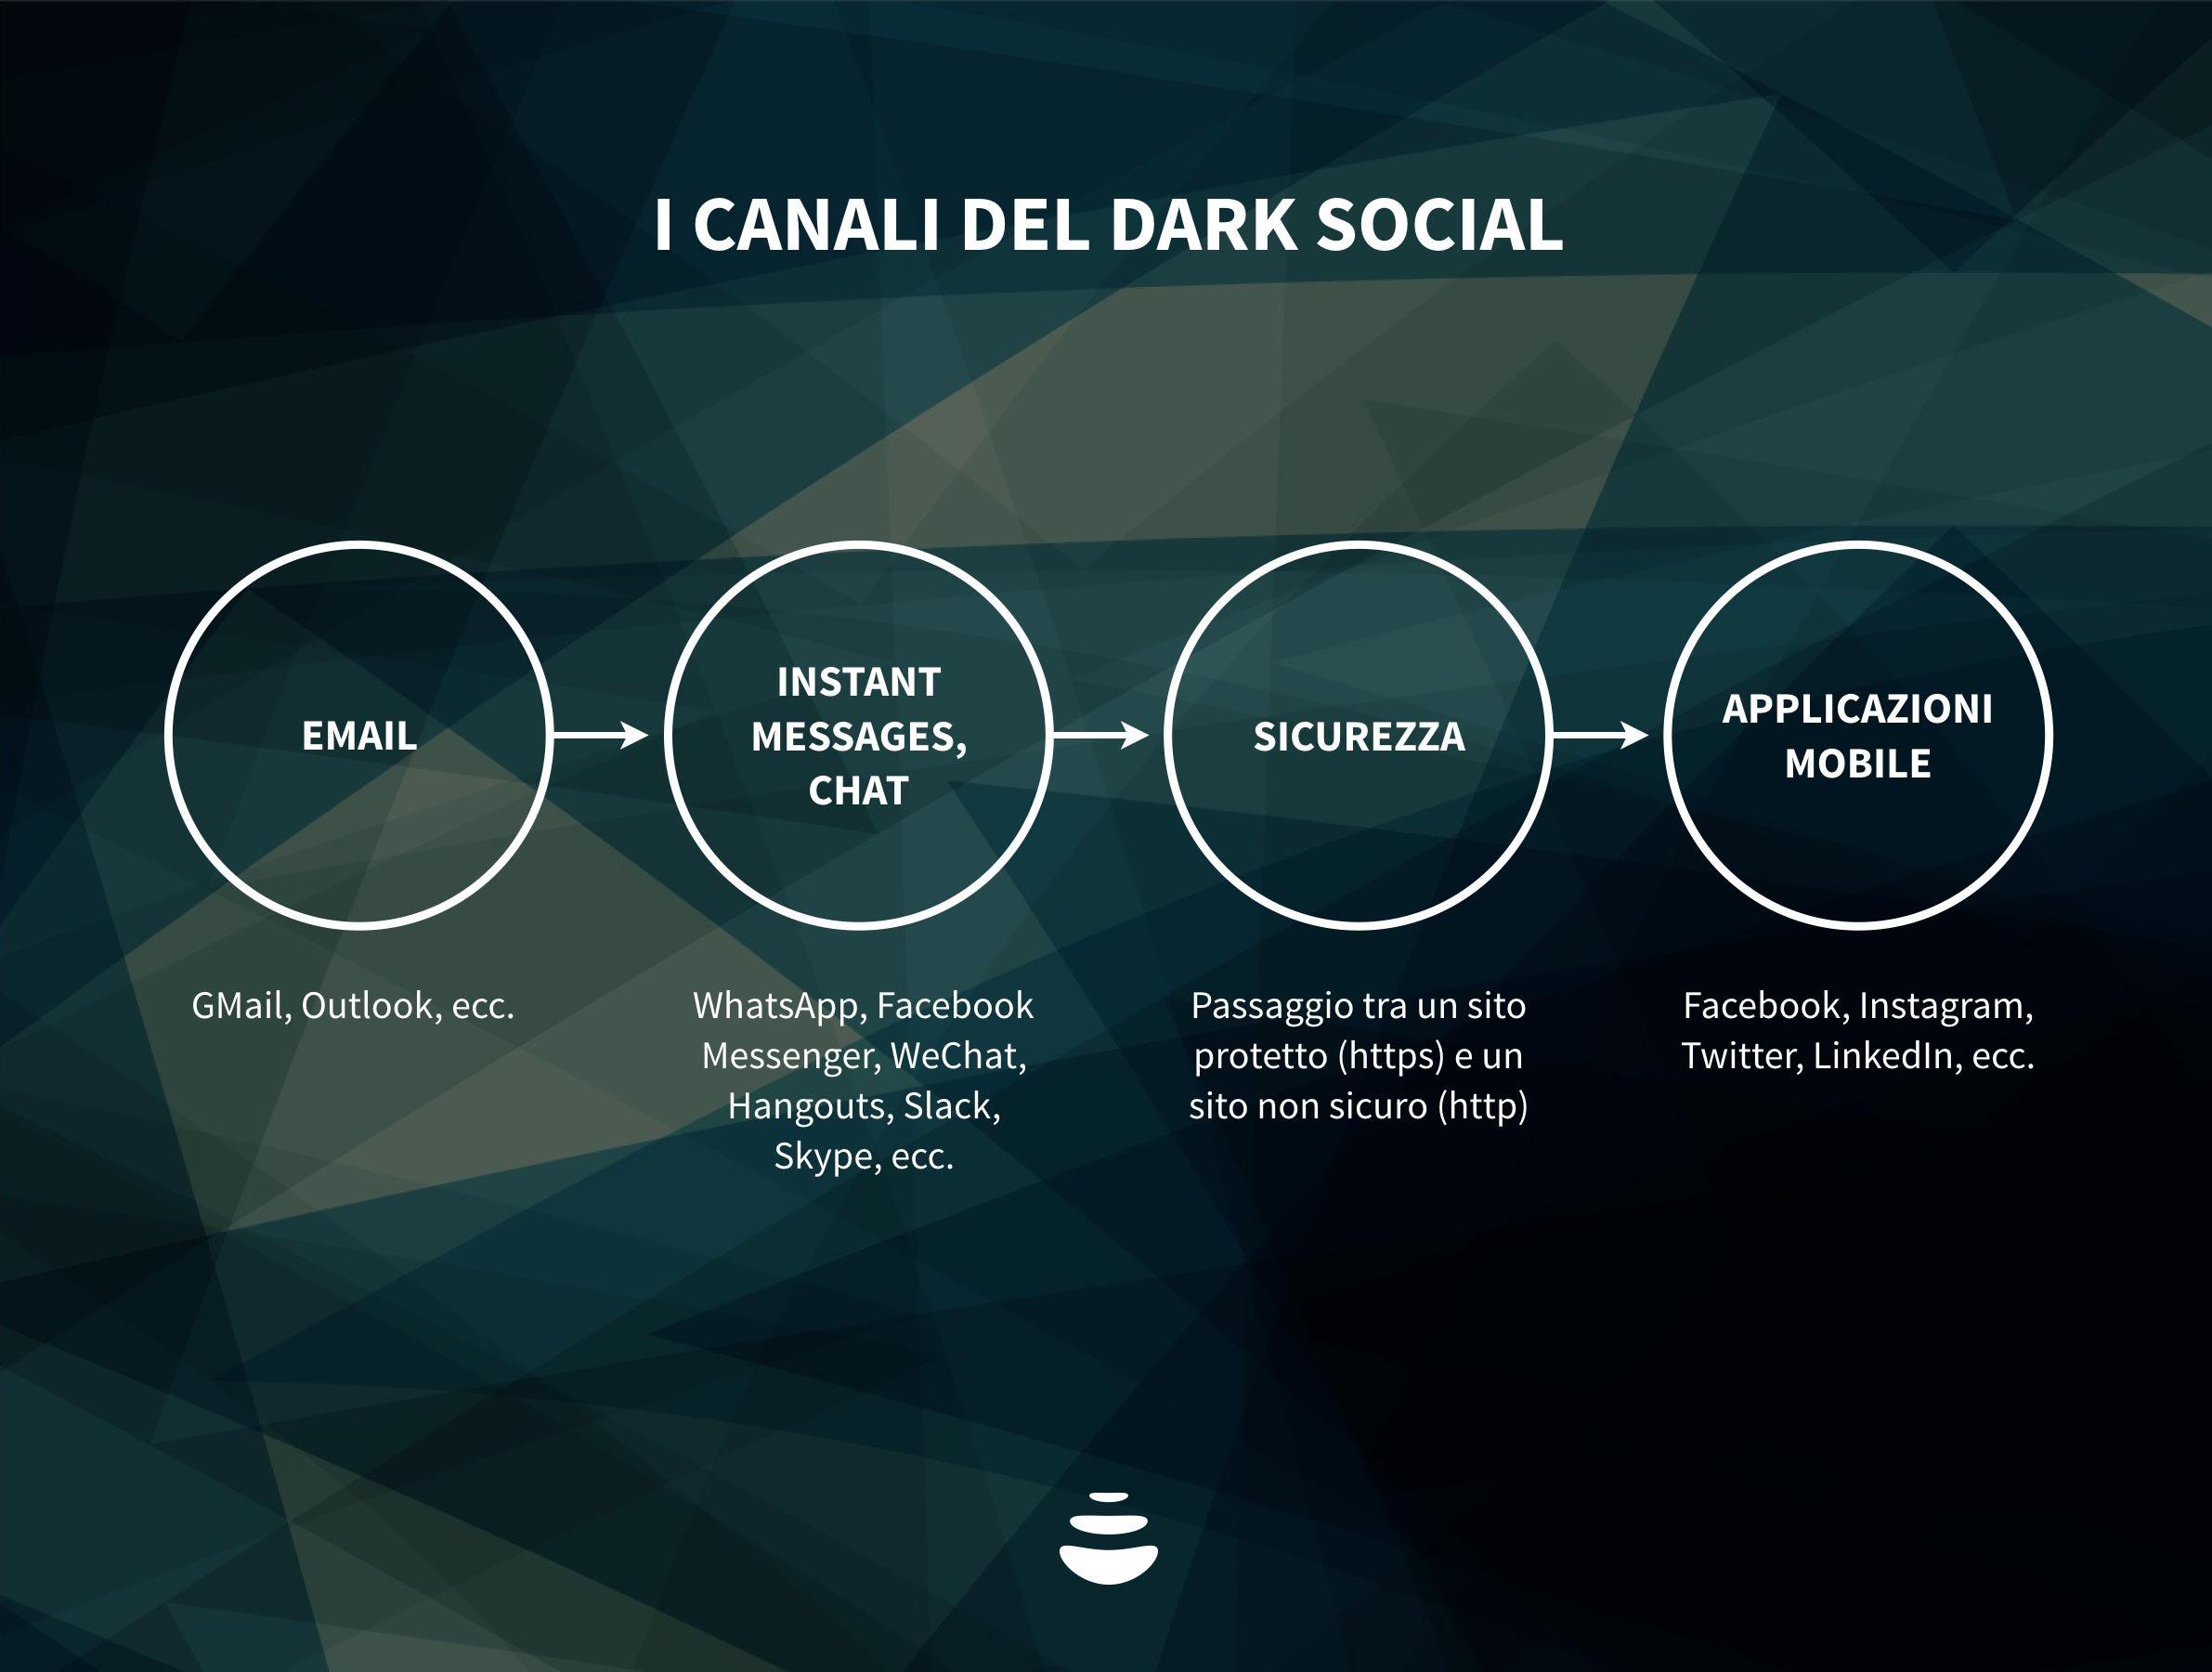 canali del dark social